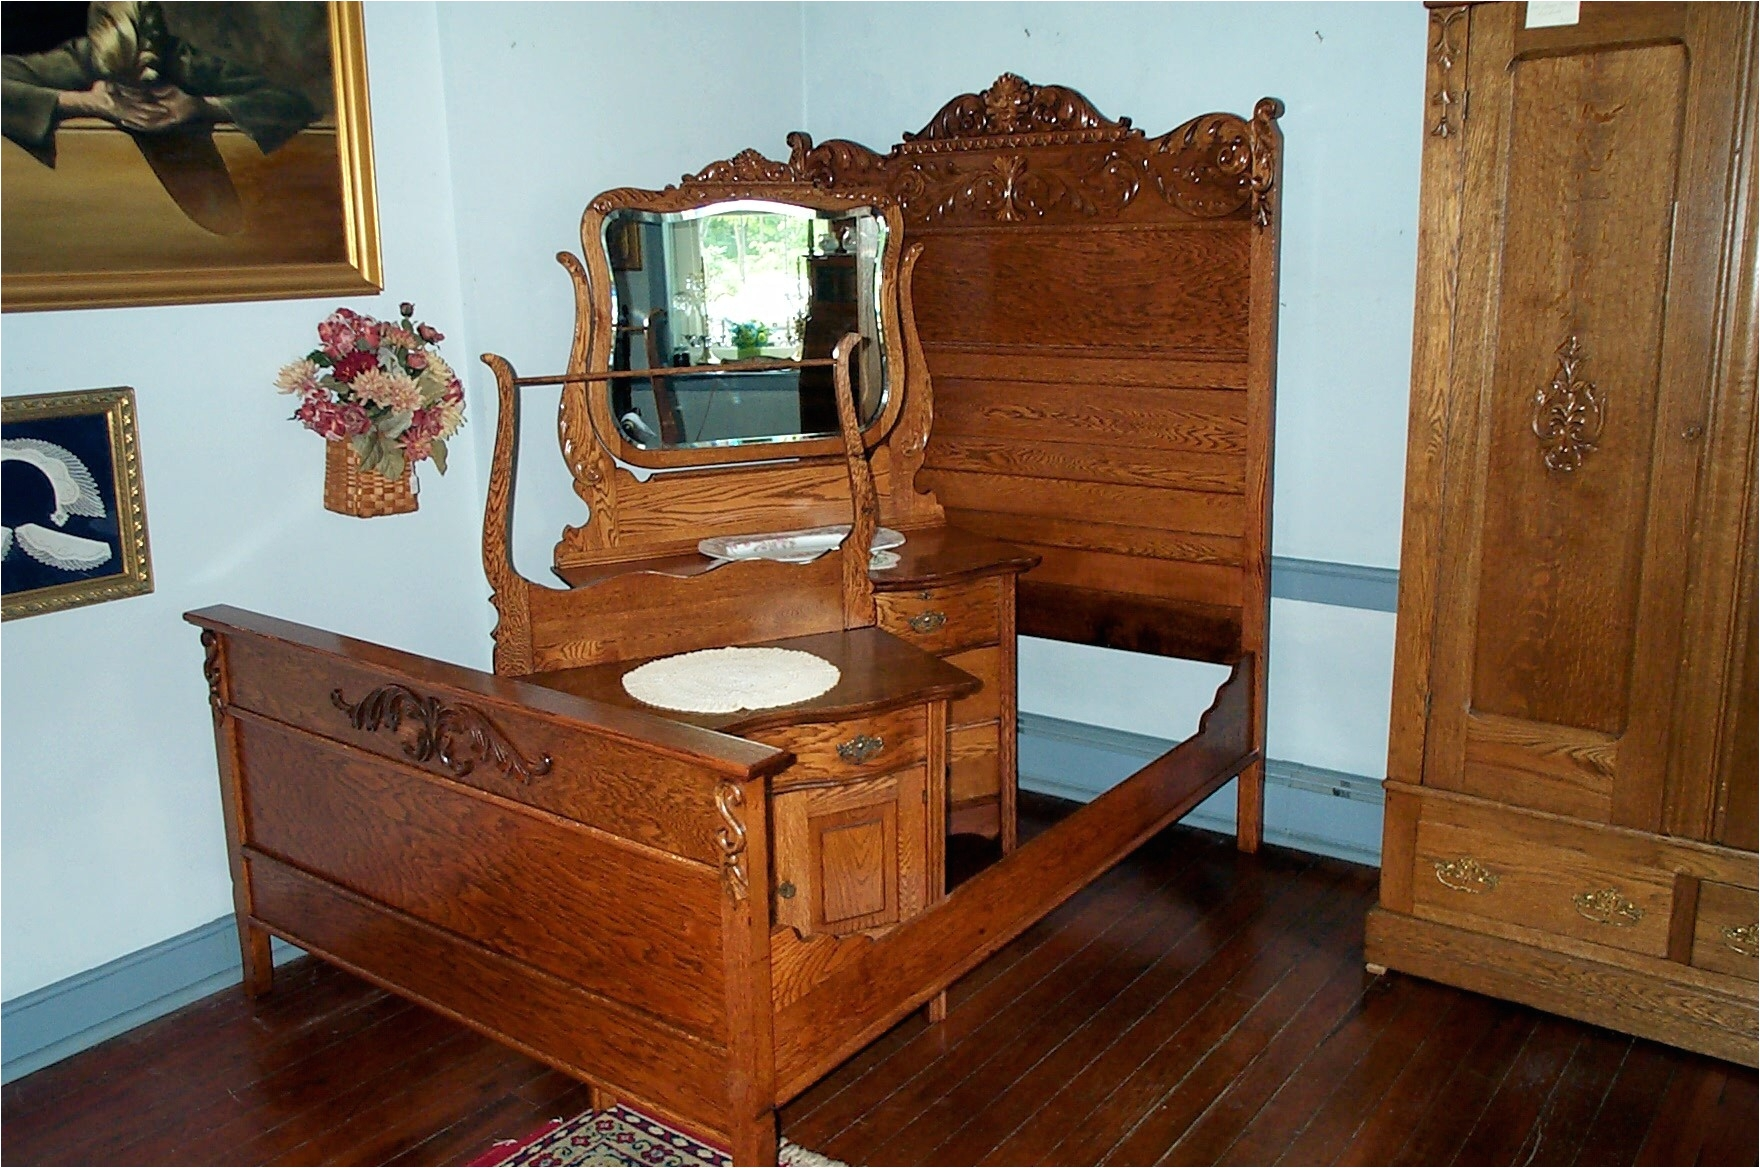 Craigslist Ma Furniture by Owner | BradsHomeFurnishings